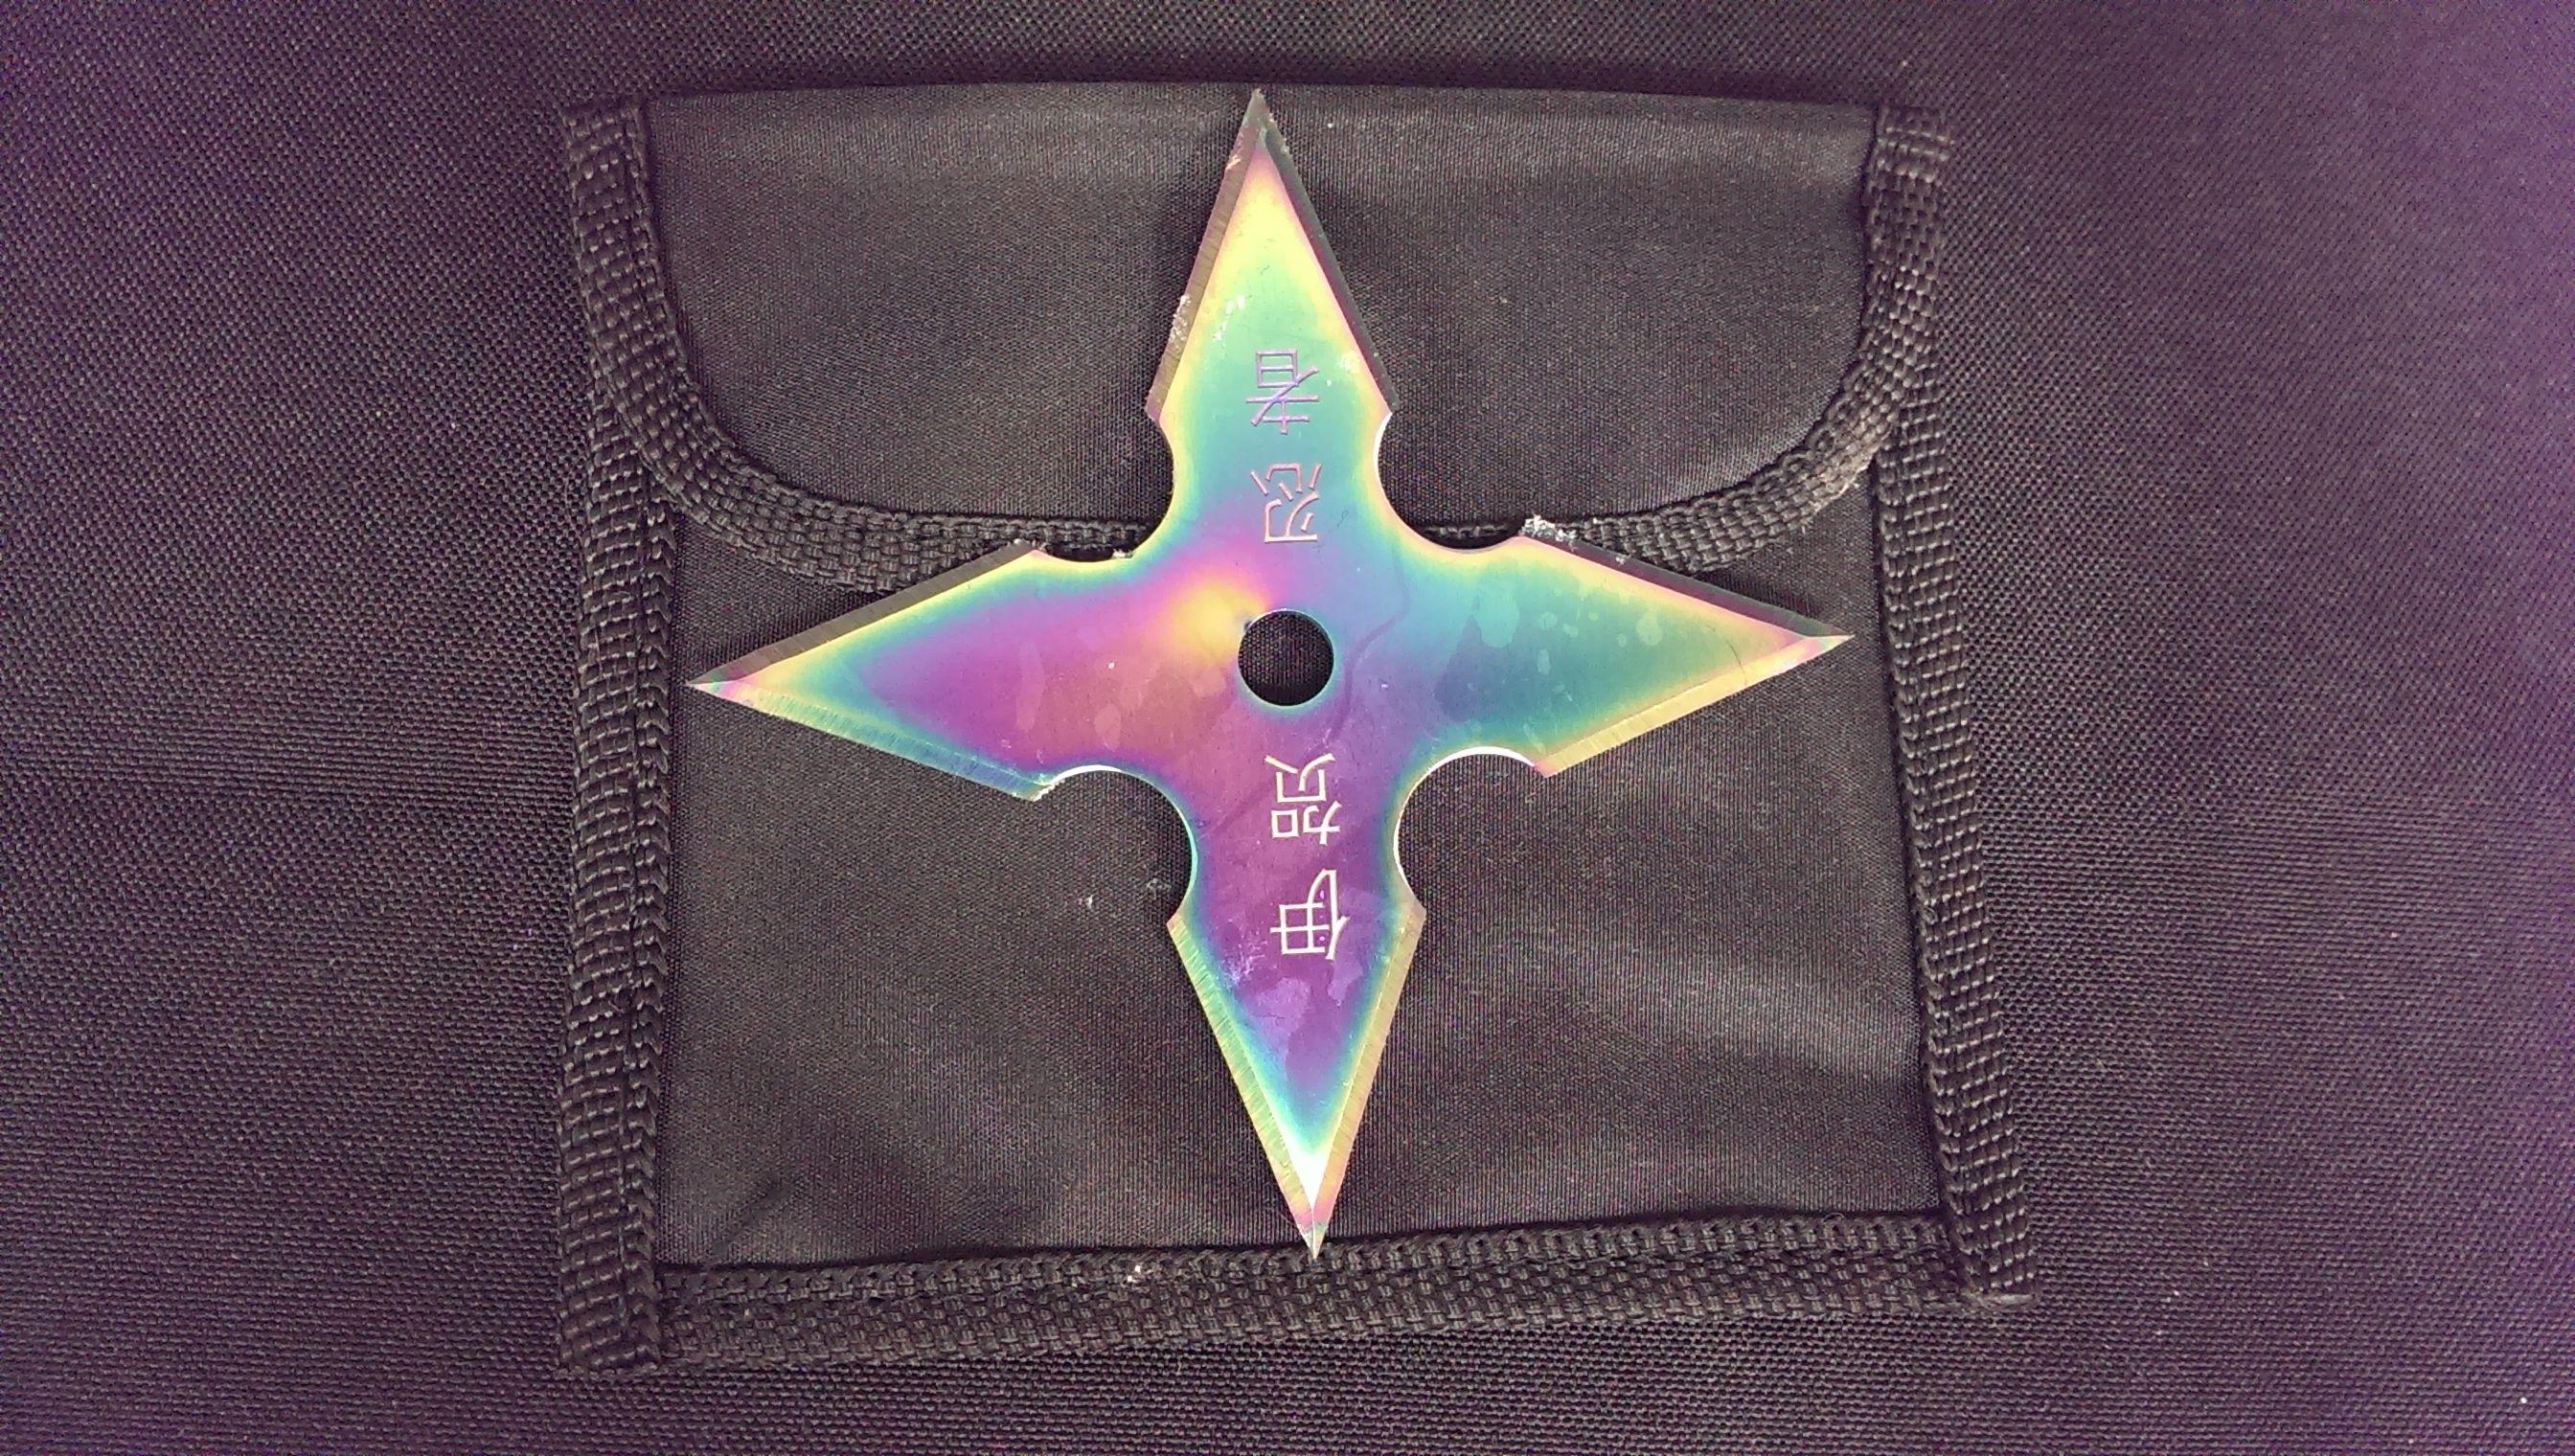 ST544-4RW Rainbow Throwing Star